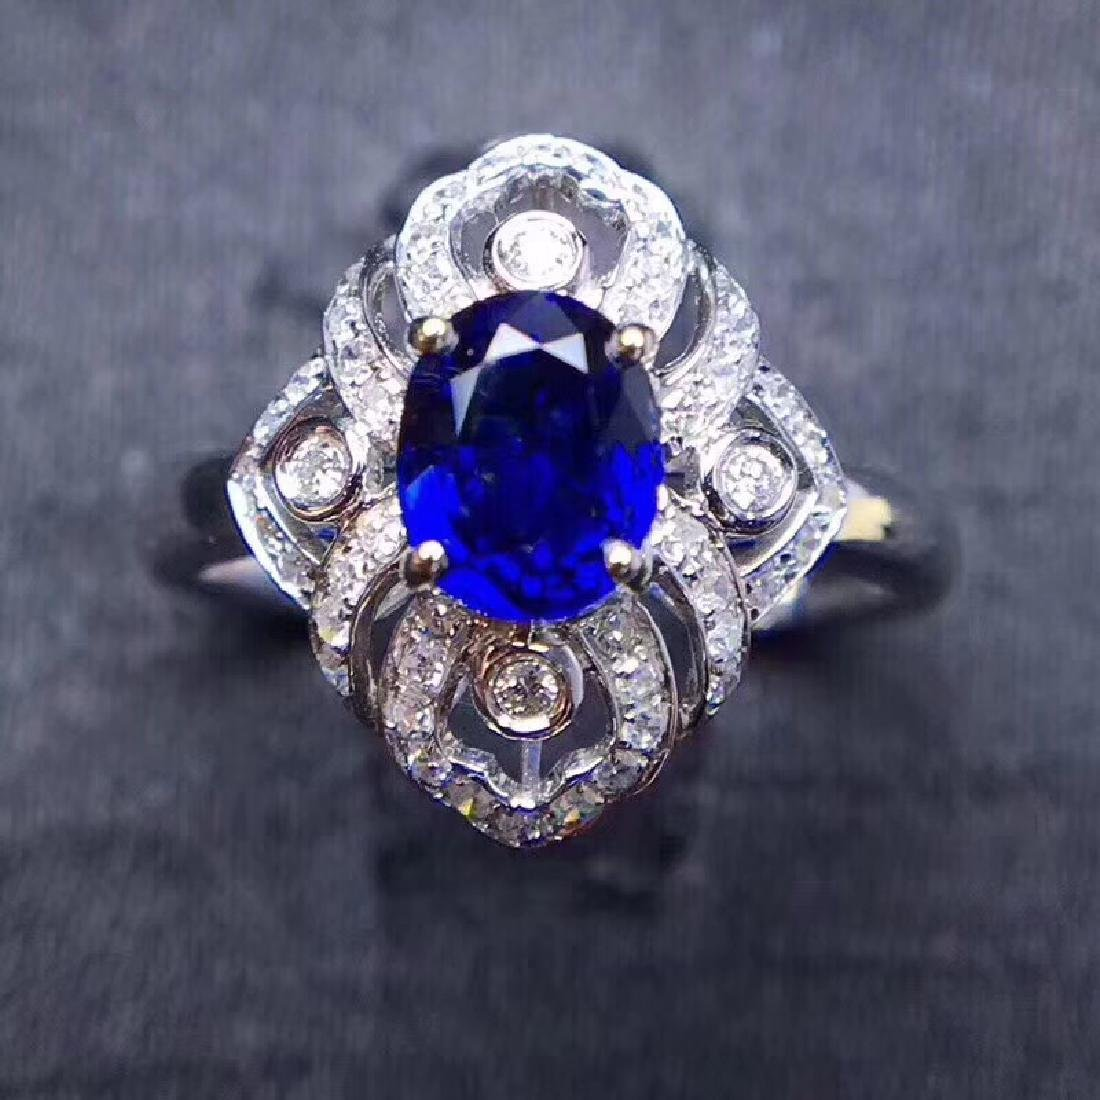 1.18 CTW Sapphire & VS Diamond Ring 18K